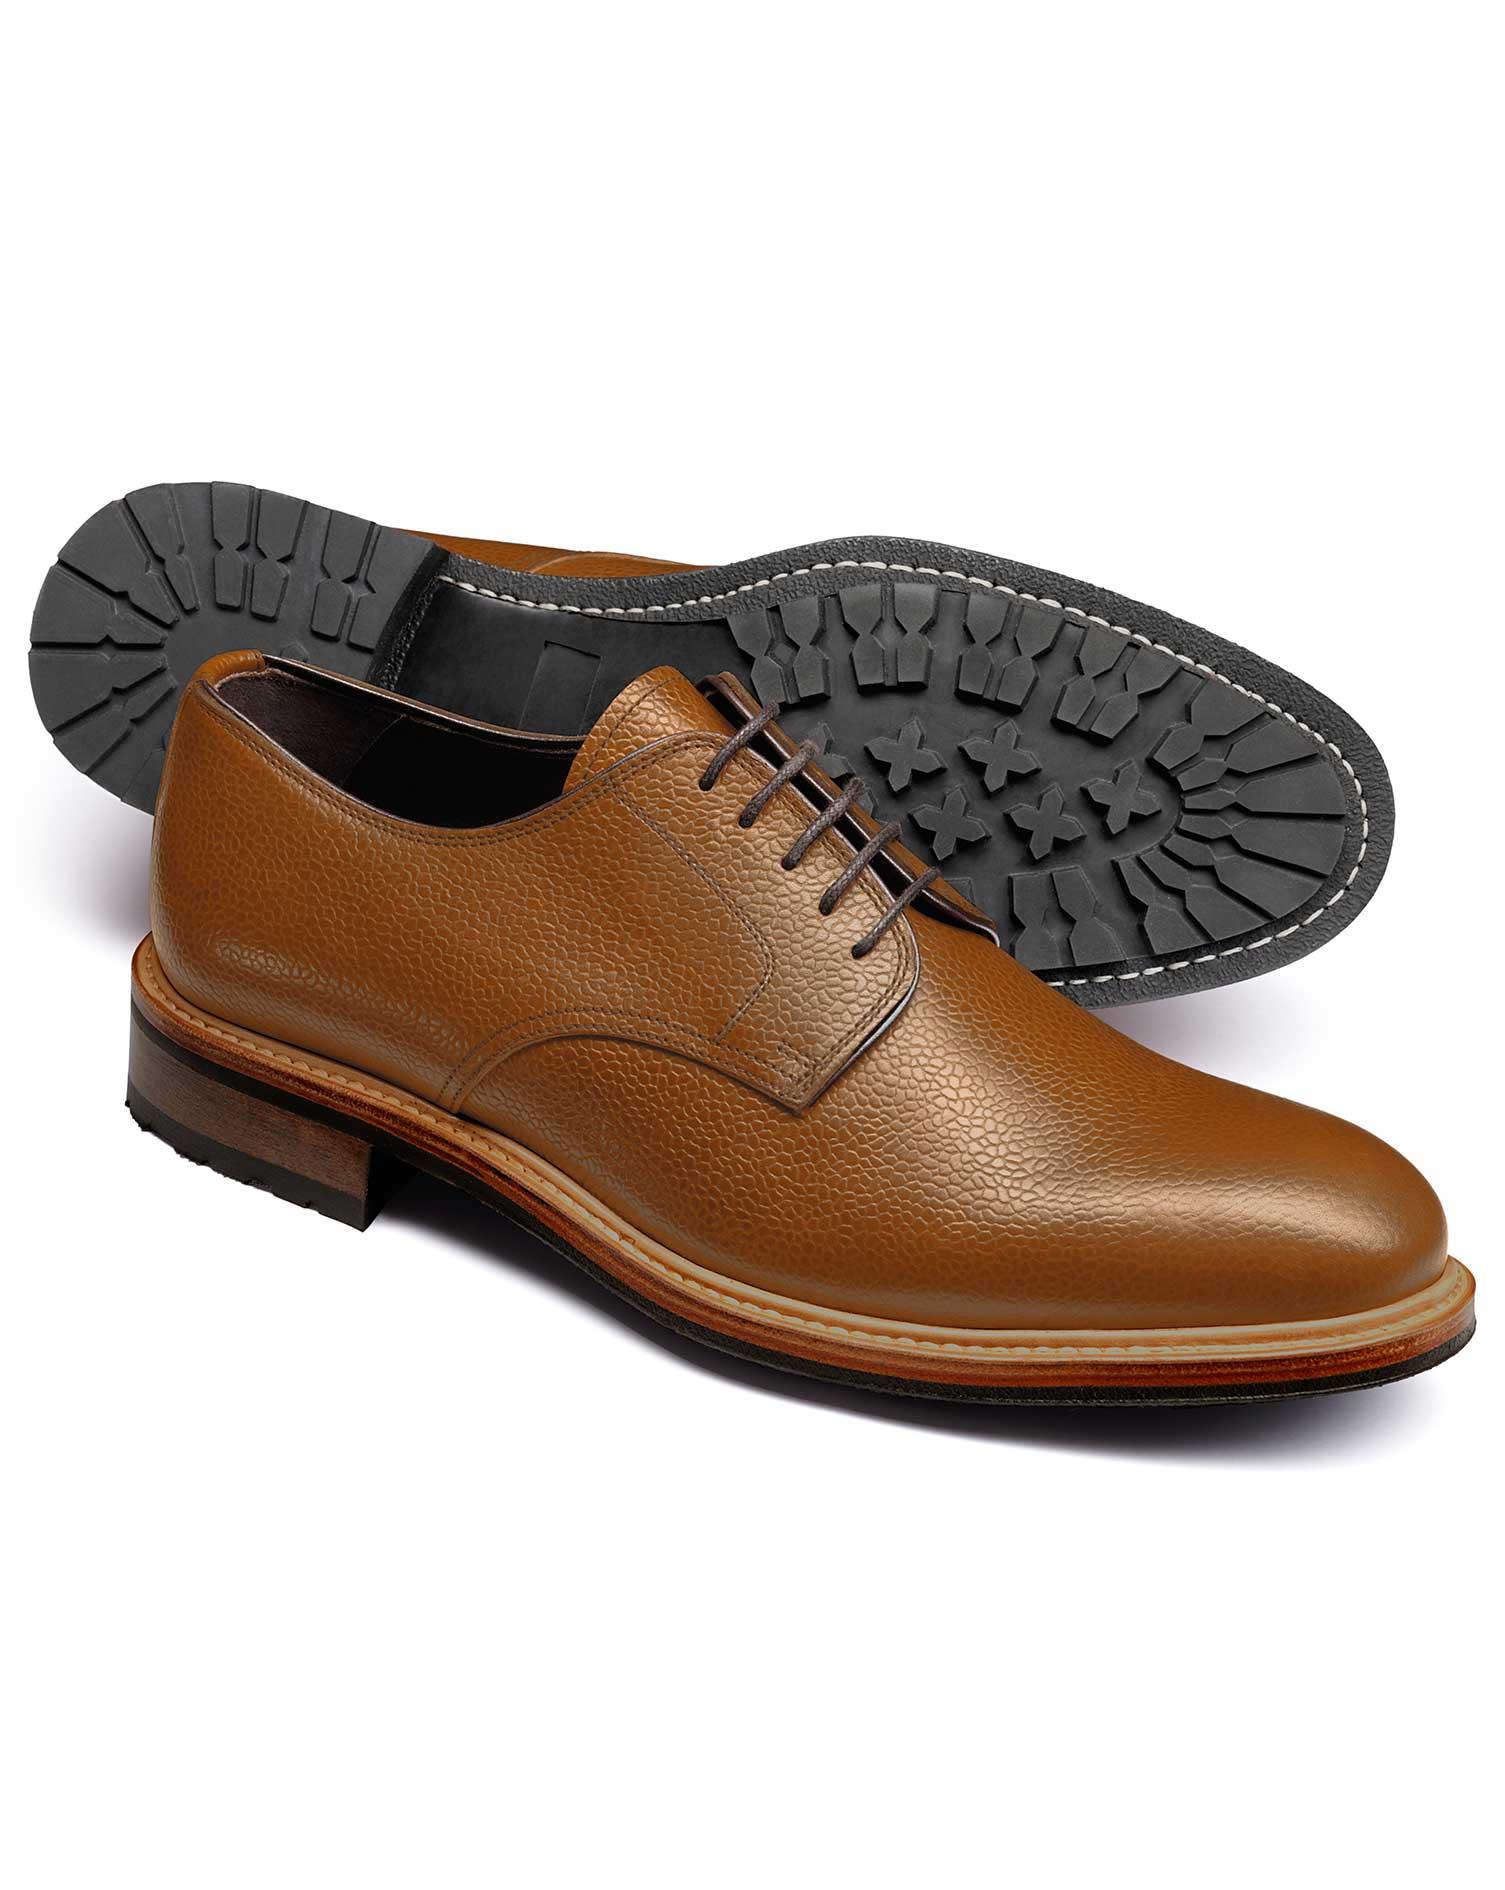 Tan Otterham Derby Shoes Size 9.5 R by Charles Tyrwhitt